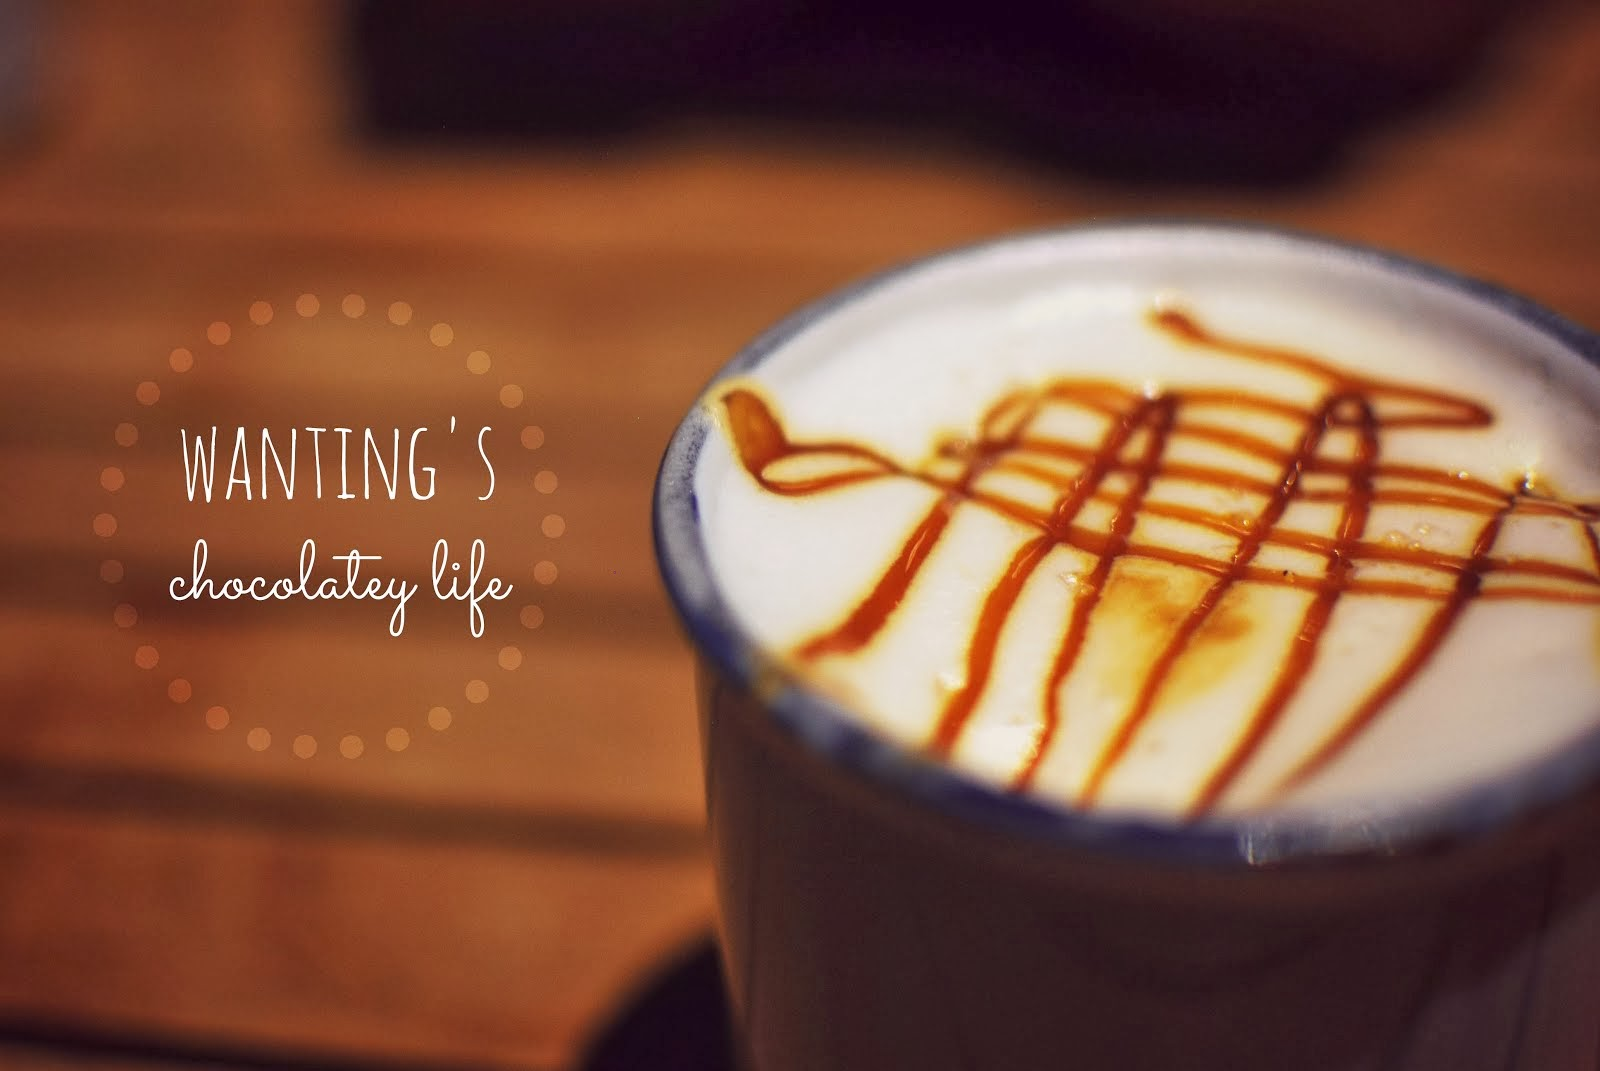 Wanting's Chocolatey Life